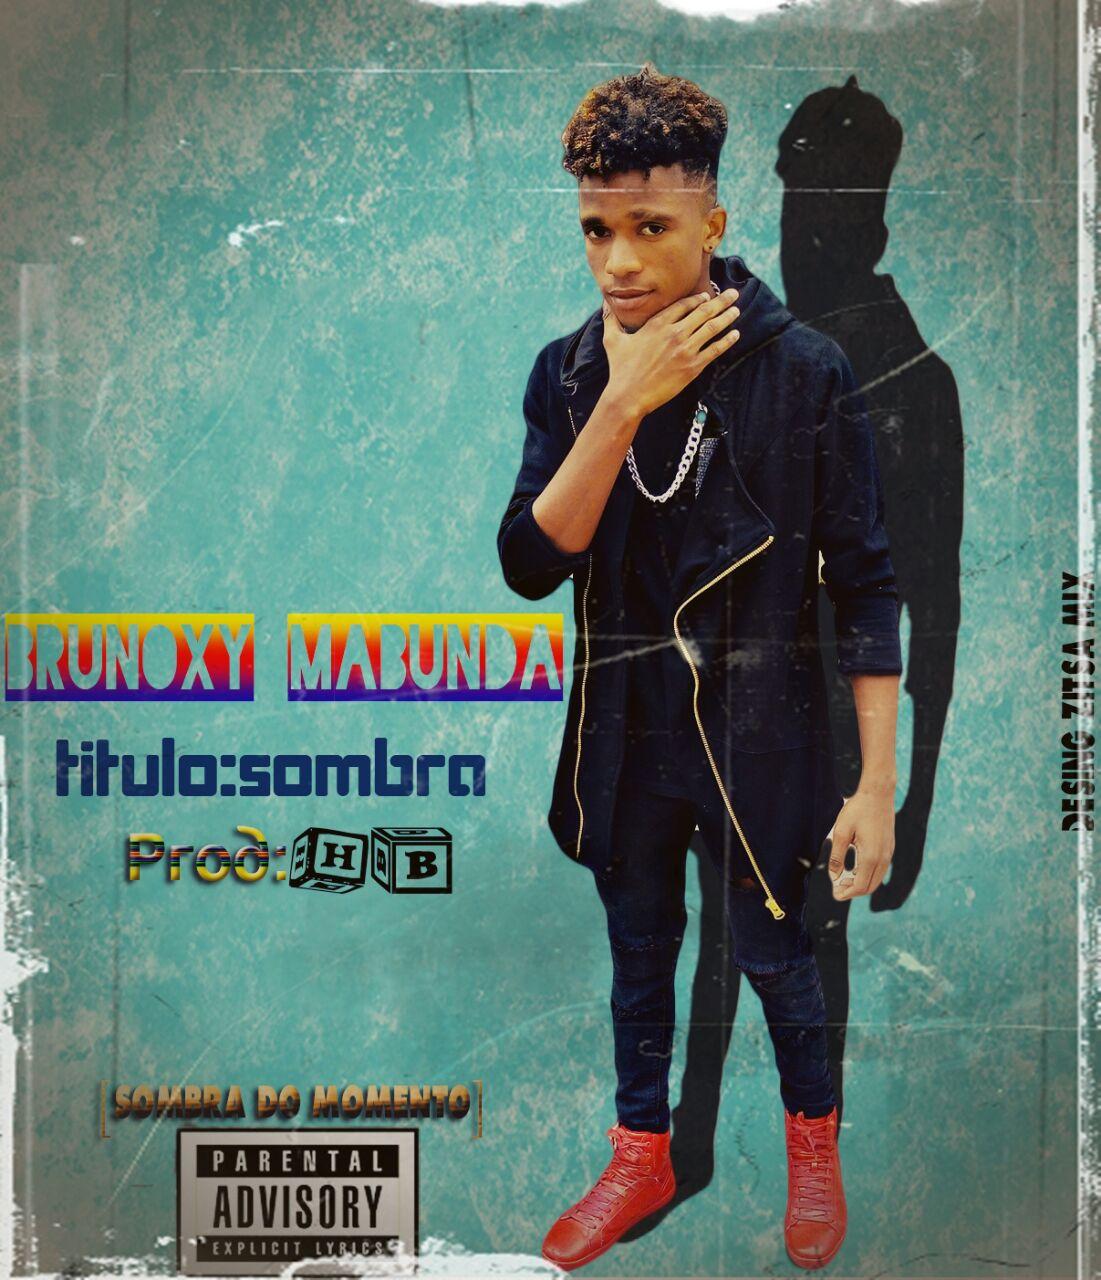 Post Malone Better Now Baixar Mp3: Brunoxy Mabunda - Sombra (2017) [Download]